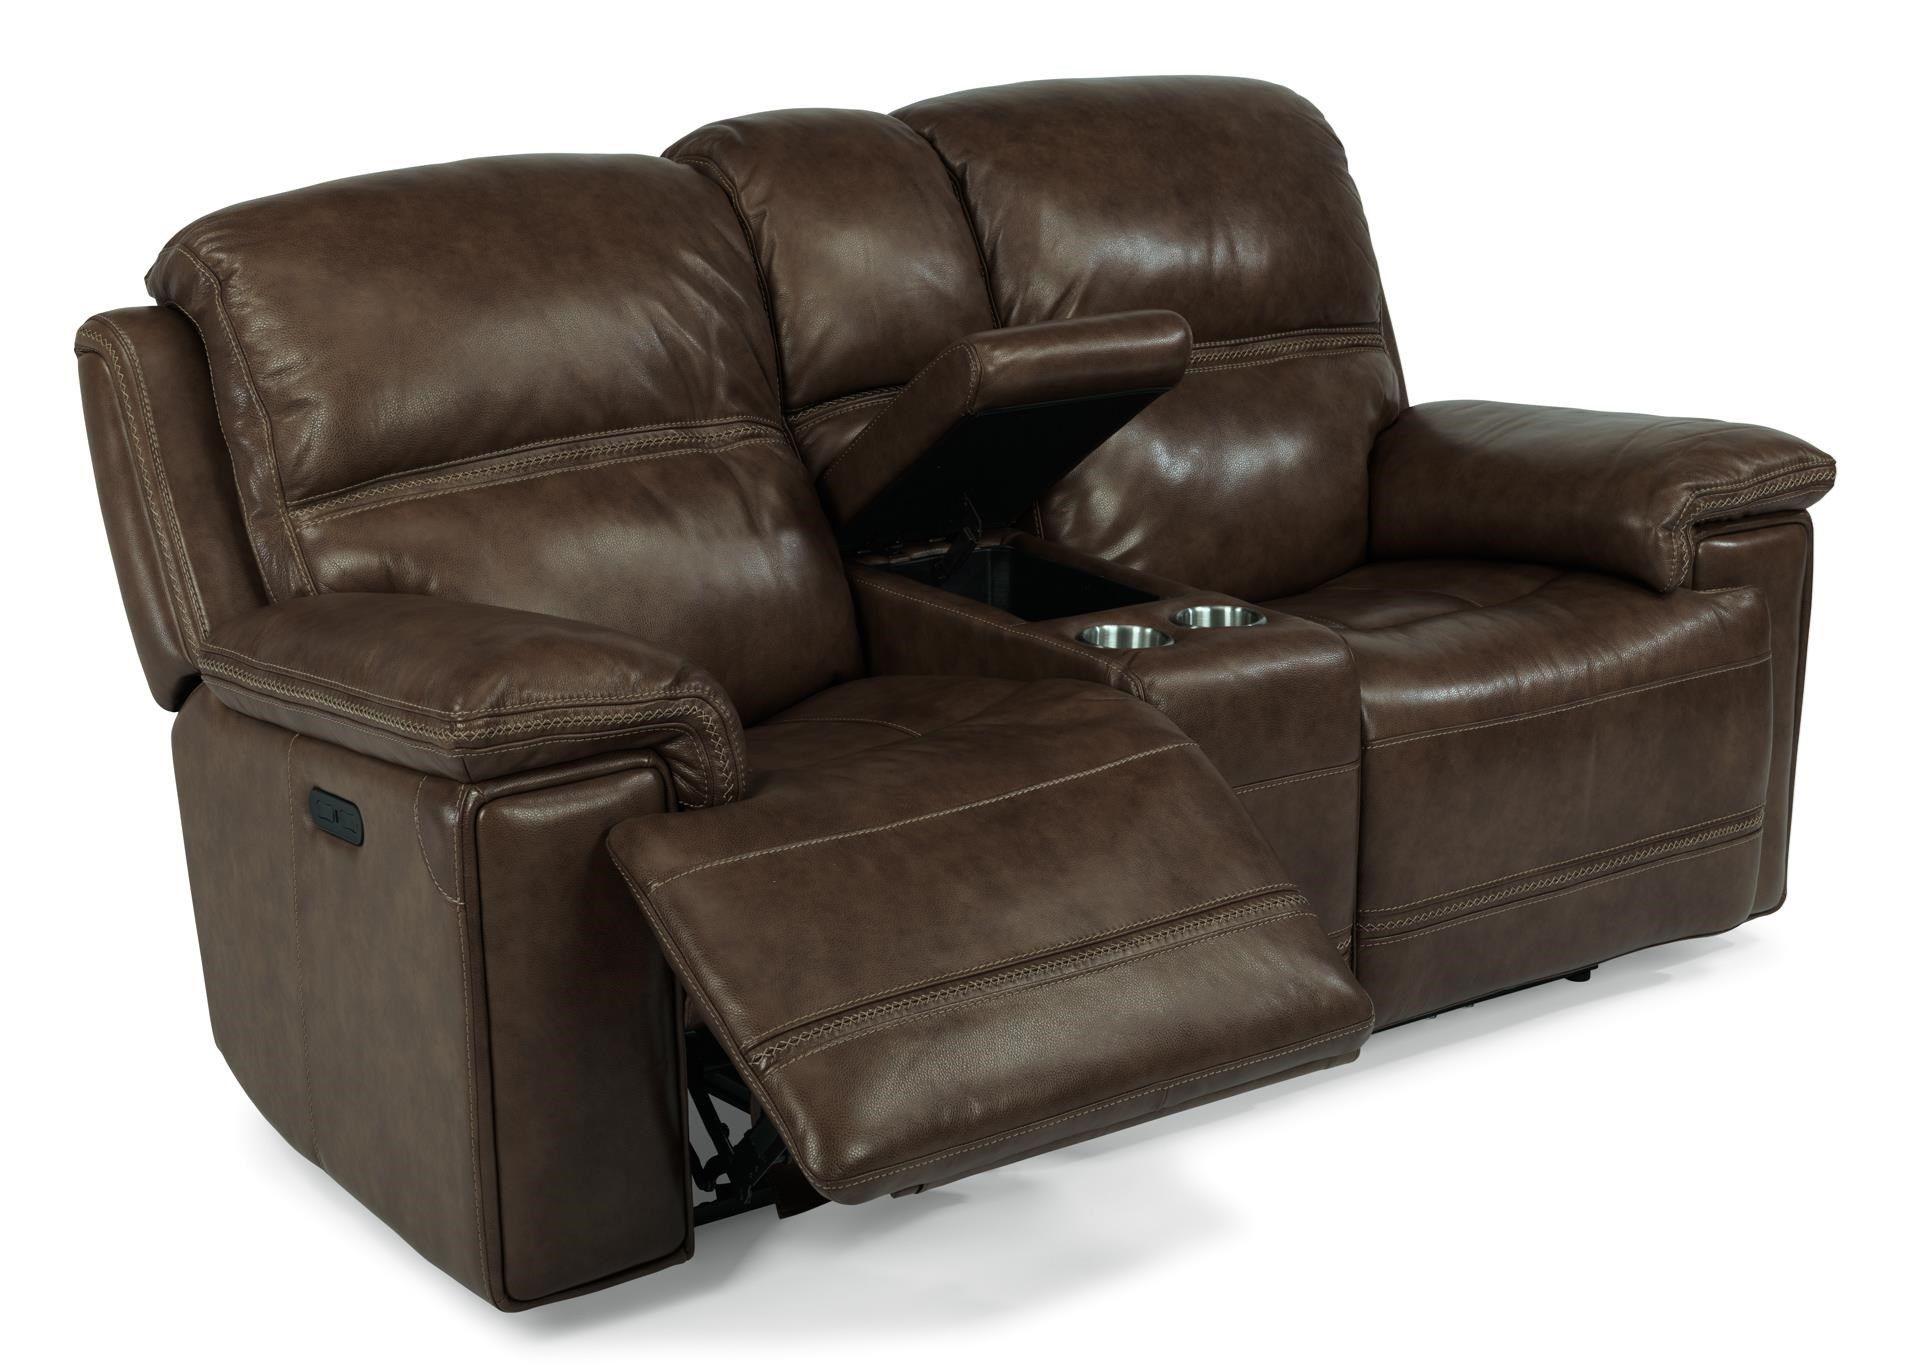 Groovy Latitudes Fenwick Recliner Leather Power Console Loveseat W Machost Co Dining Chair Design Ideas Machostcouk